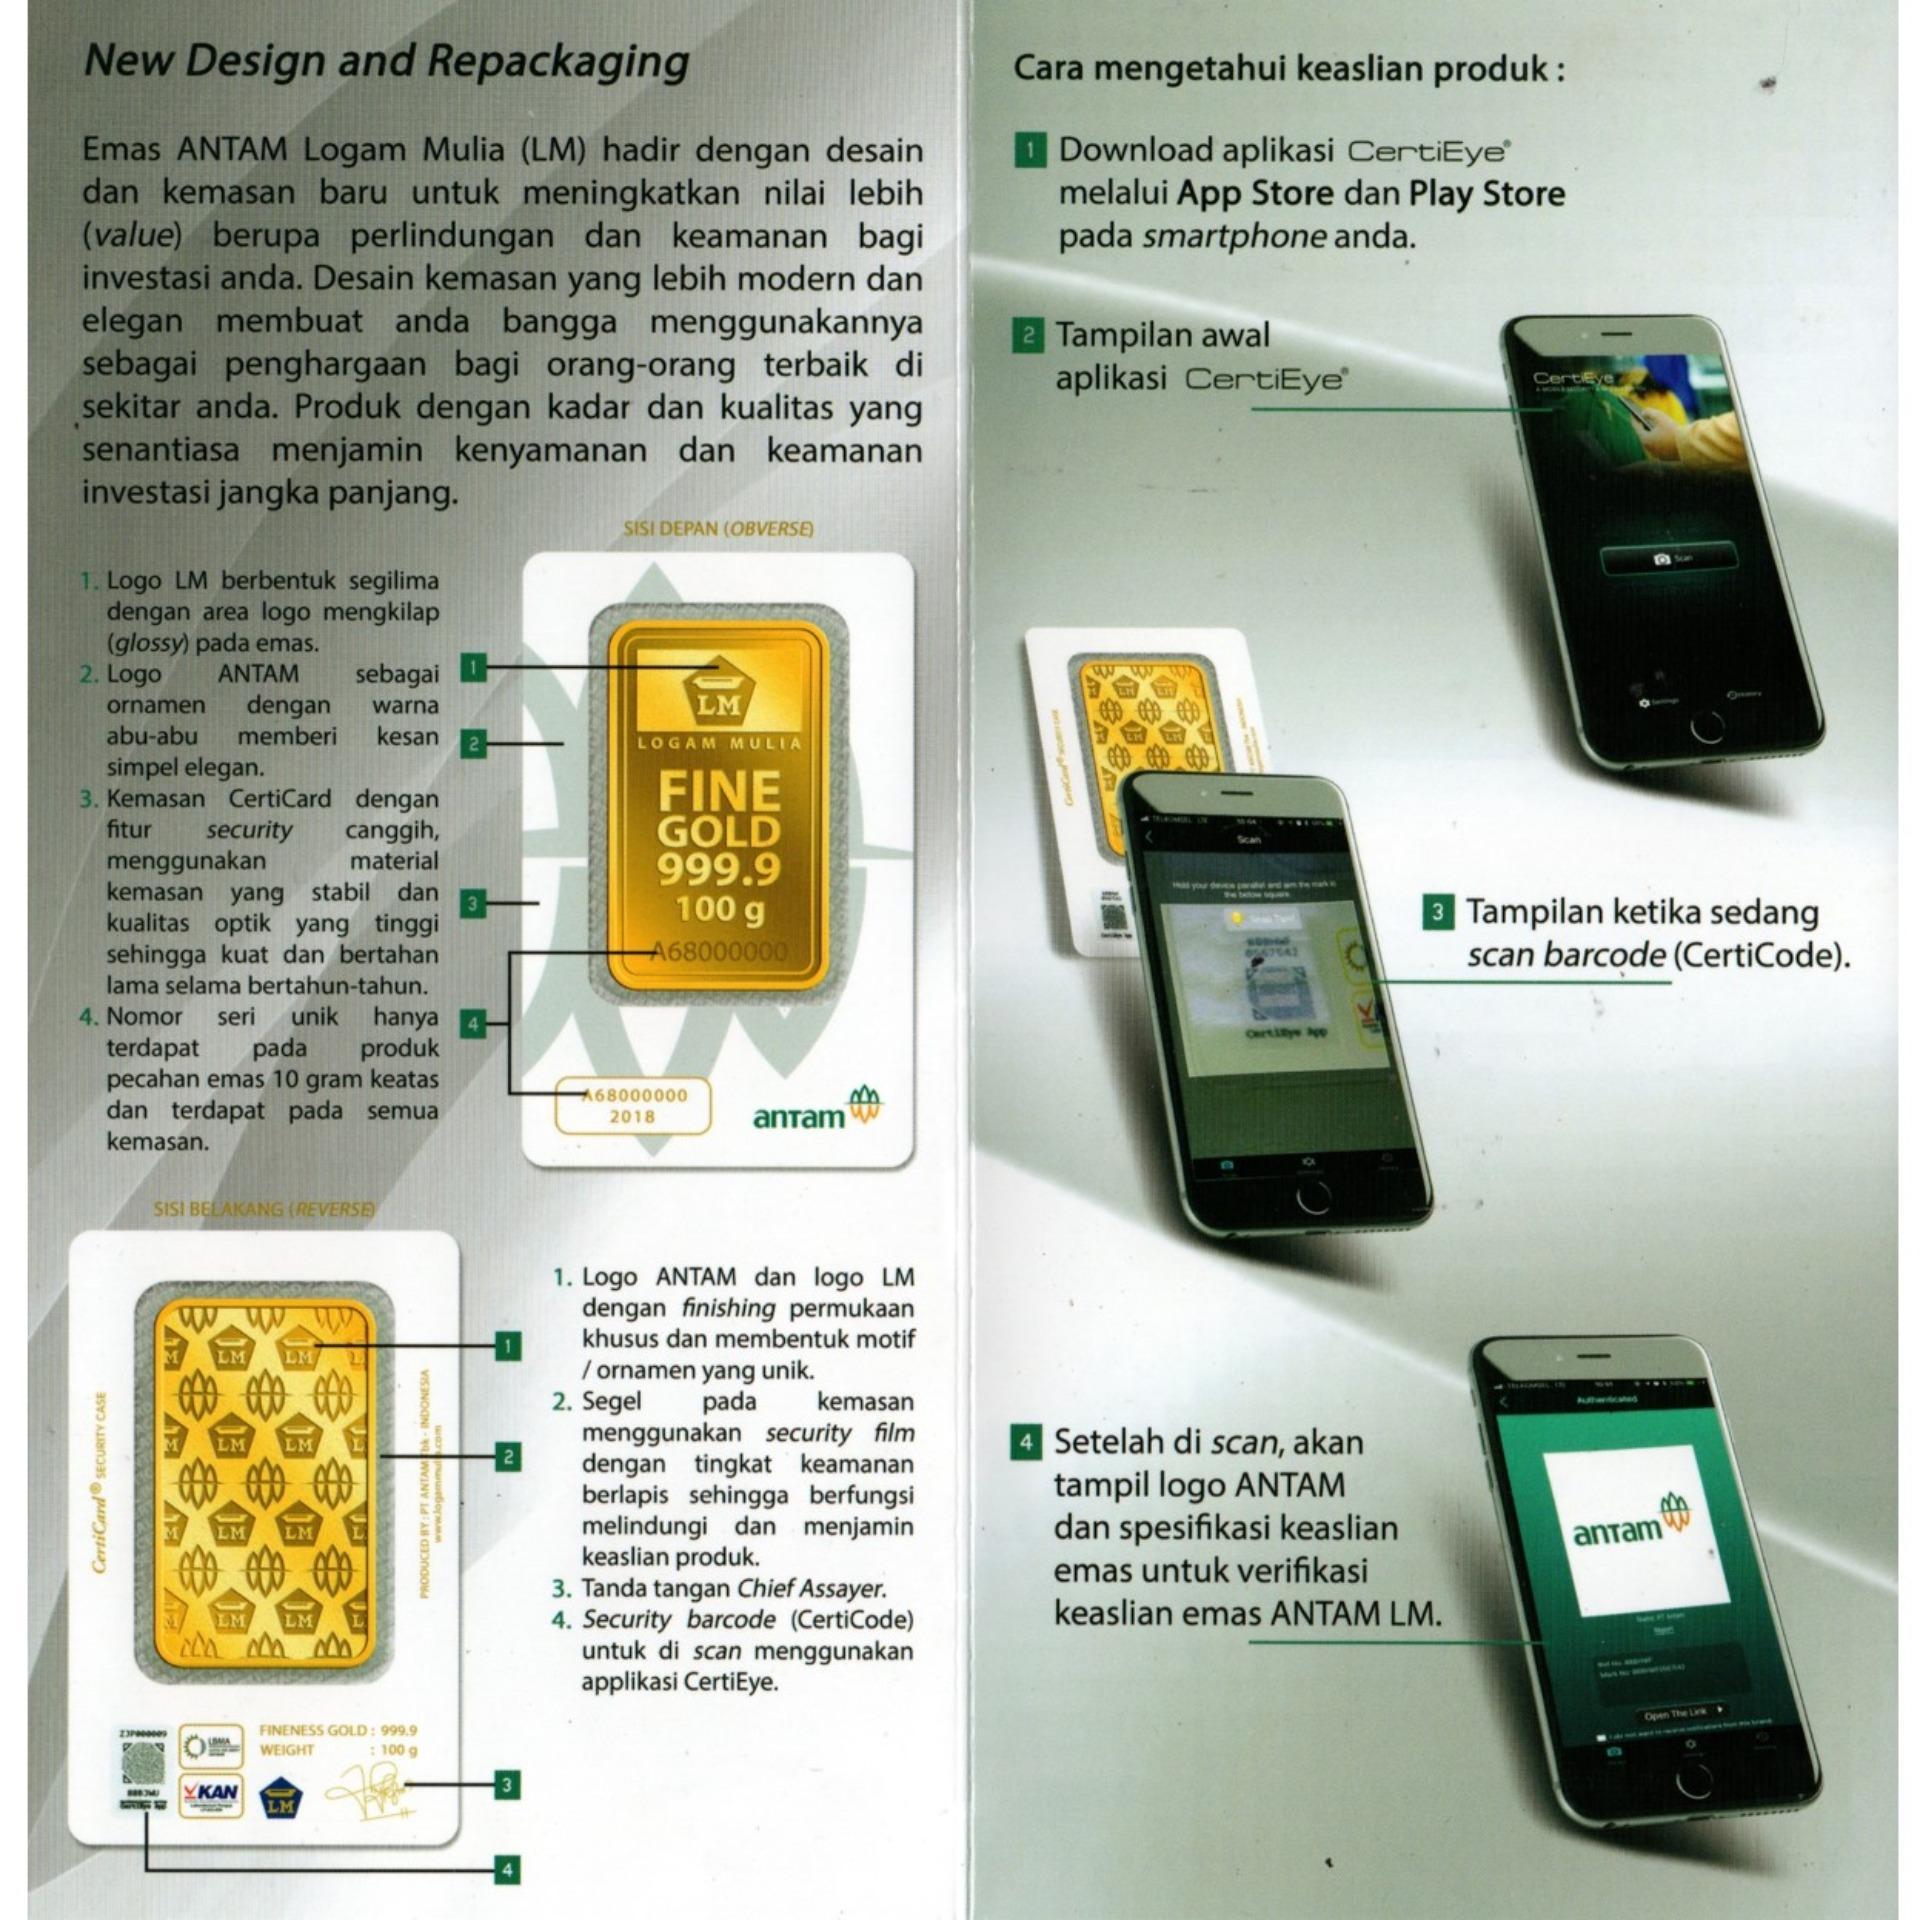 Gold Logam Mulia Lm Sertifikat Asli Antam 05 Gram Emas Batangan Voucher Belanja 11 24 Karat Resmi Lazada Indonesia